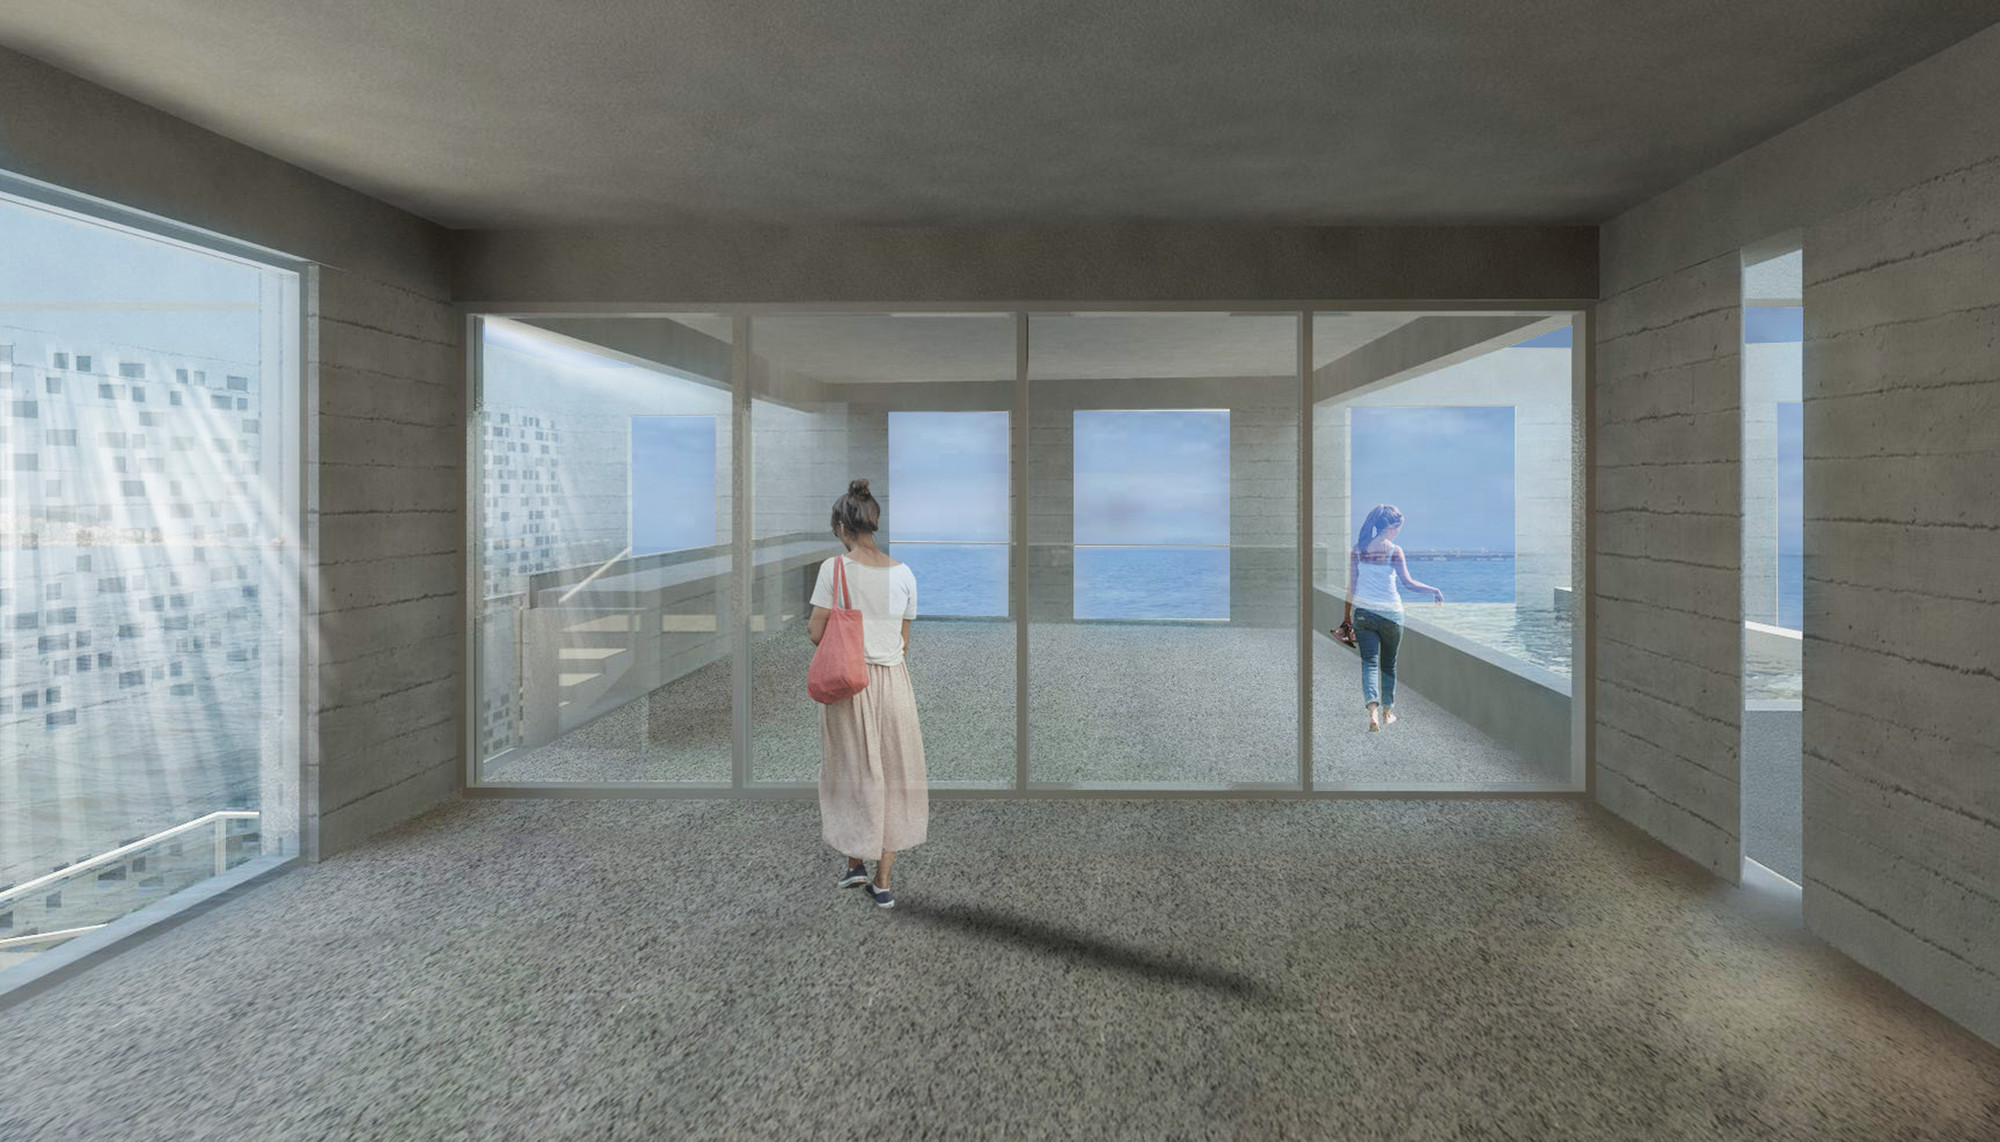 Imagen Interior 03. Image Courtesy of Seinfeld Arquitectos